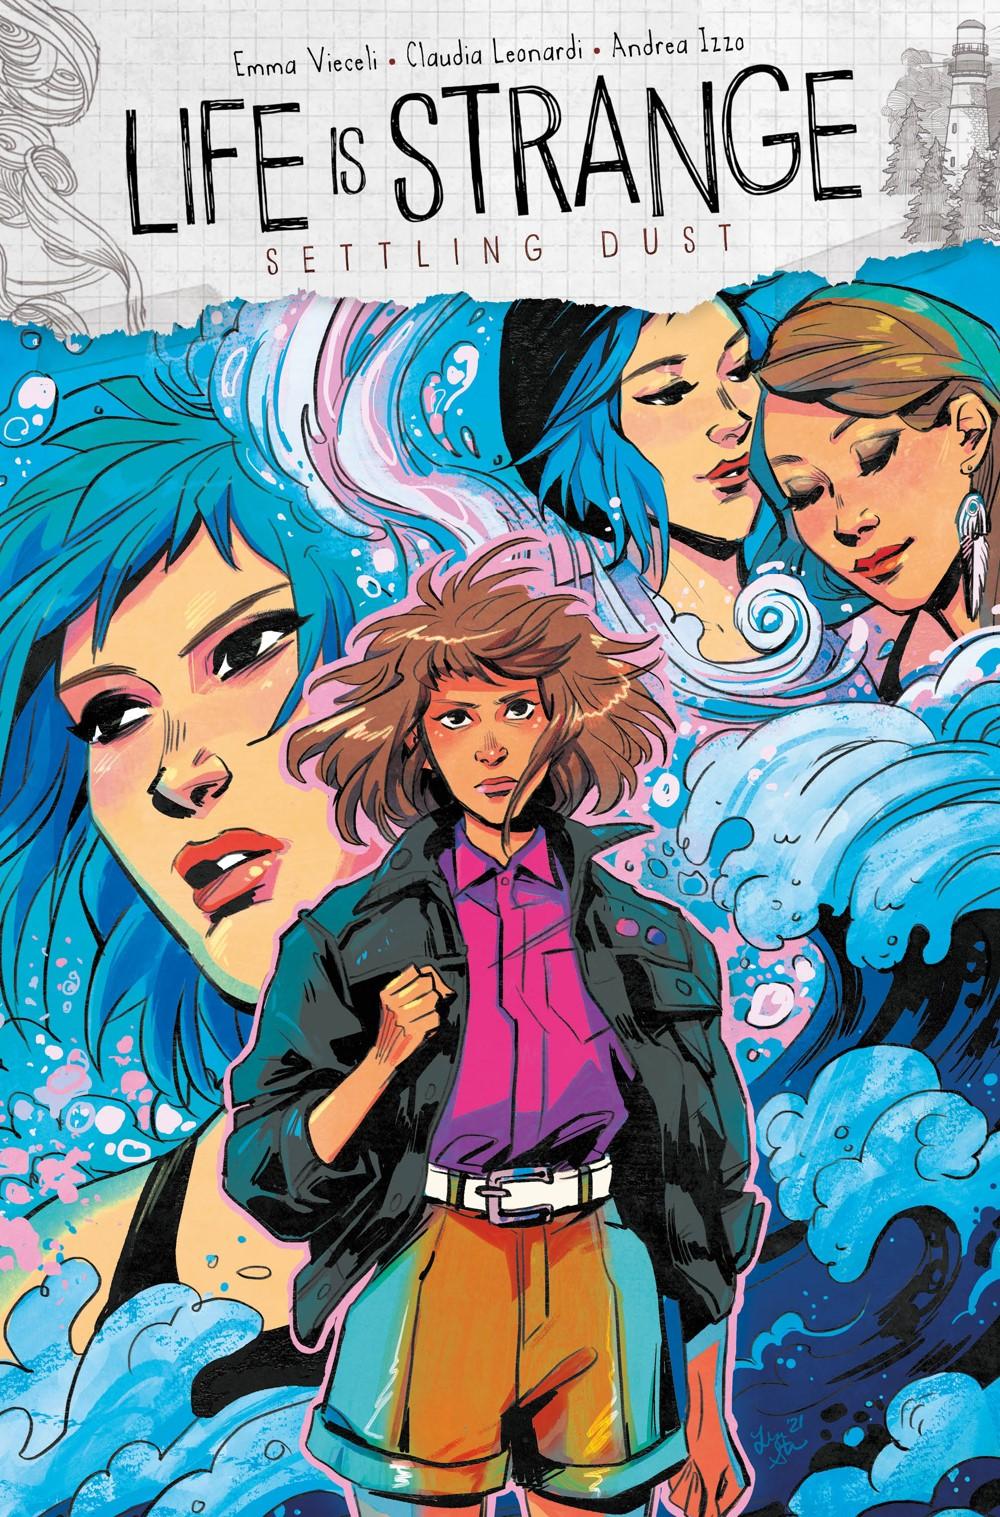 LIFE-IS-STRANGE-SETTLING-DUST-2-CVR-A-STERLE Titan Comics October 2021 Solicitations